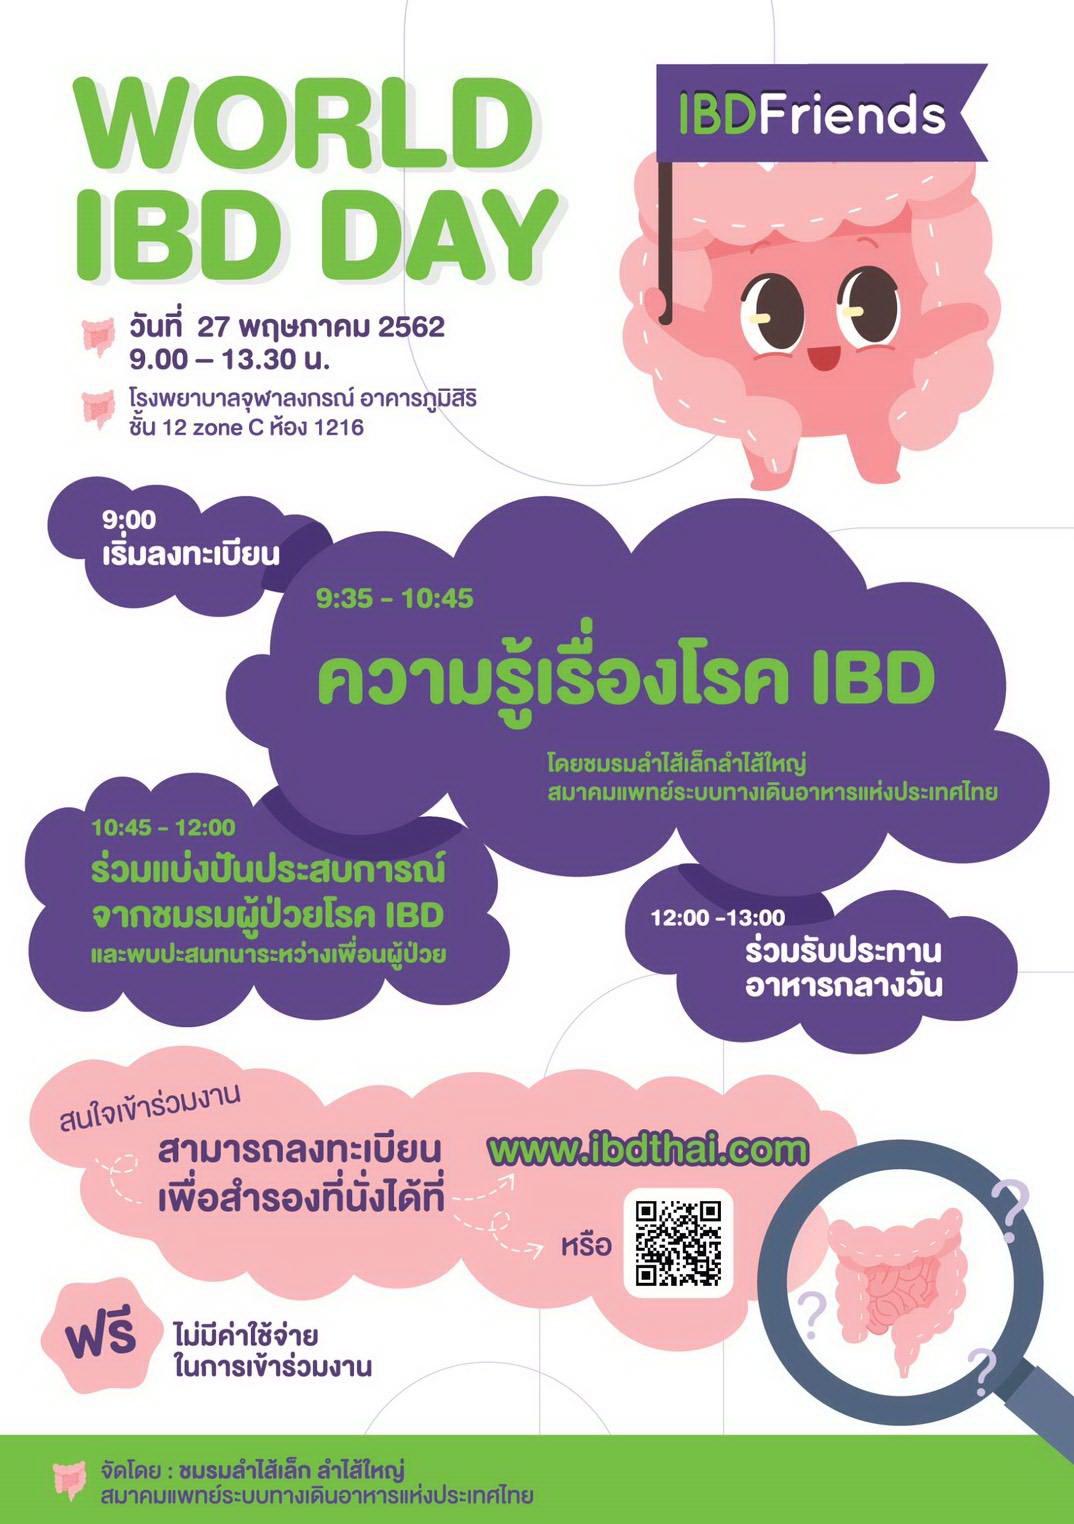 World IBD Day : May 27, 2019